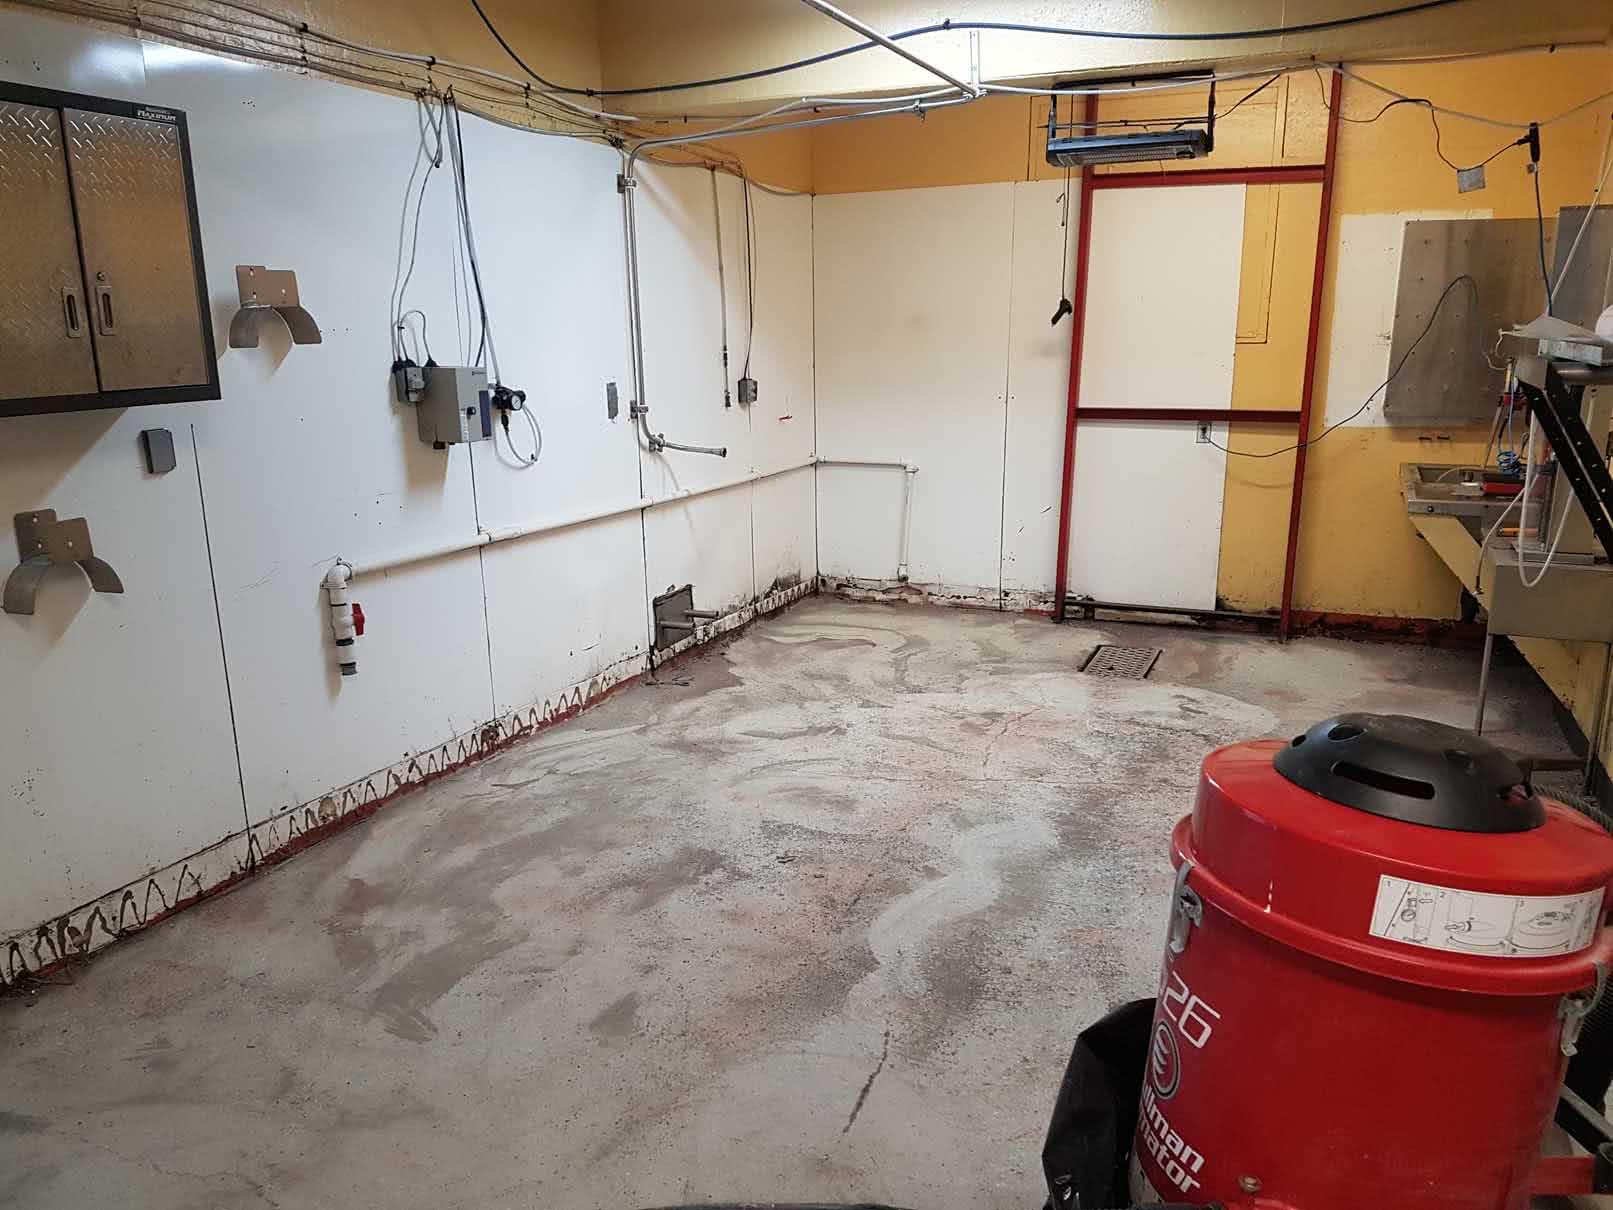 Urethane concrete floor coating at Merridale Cidery